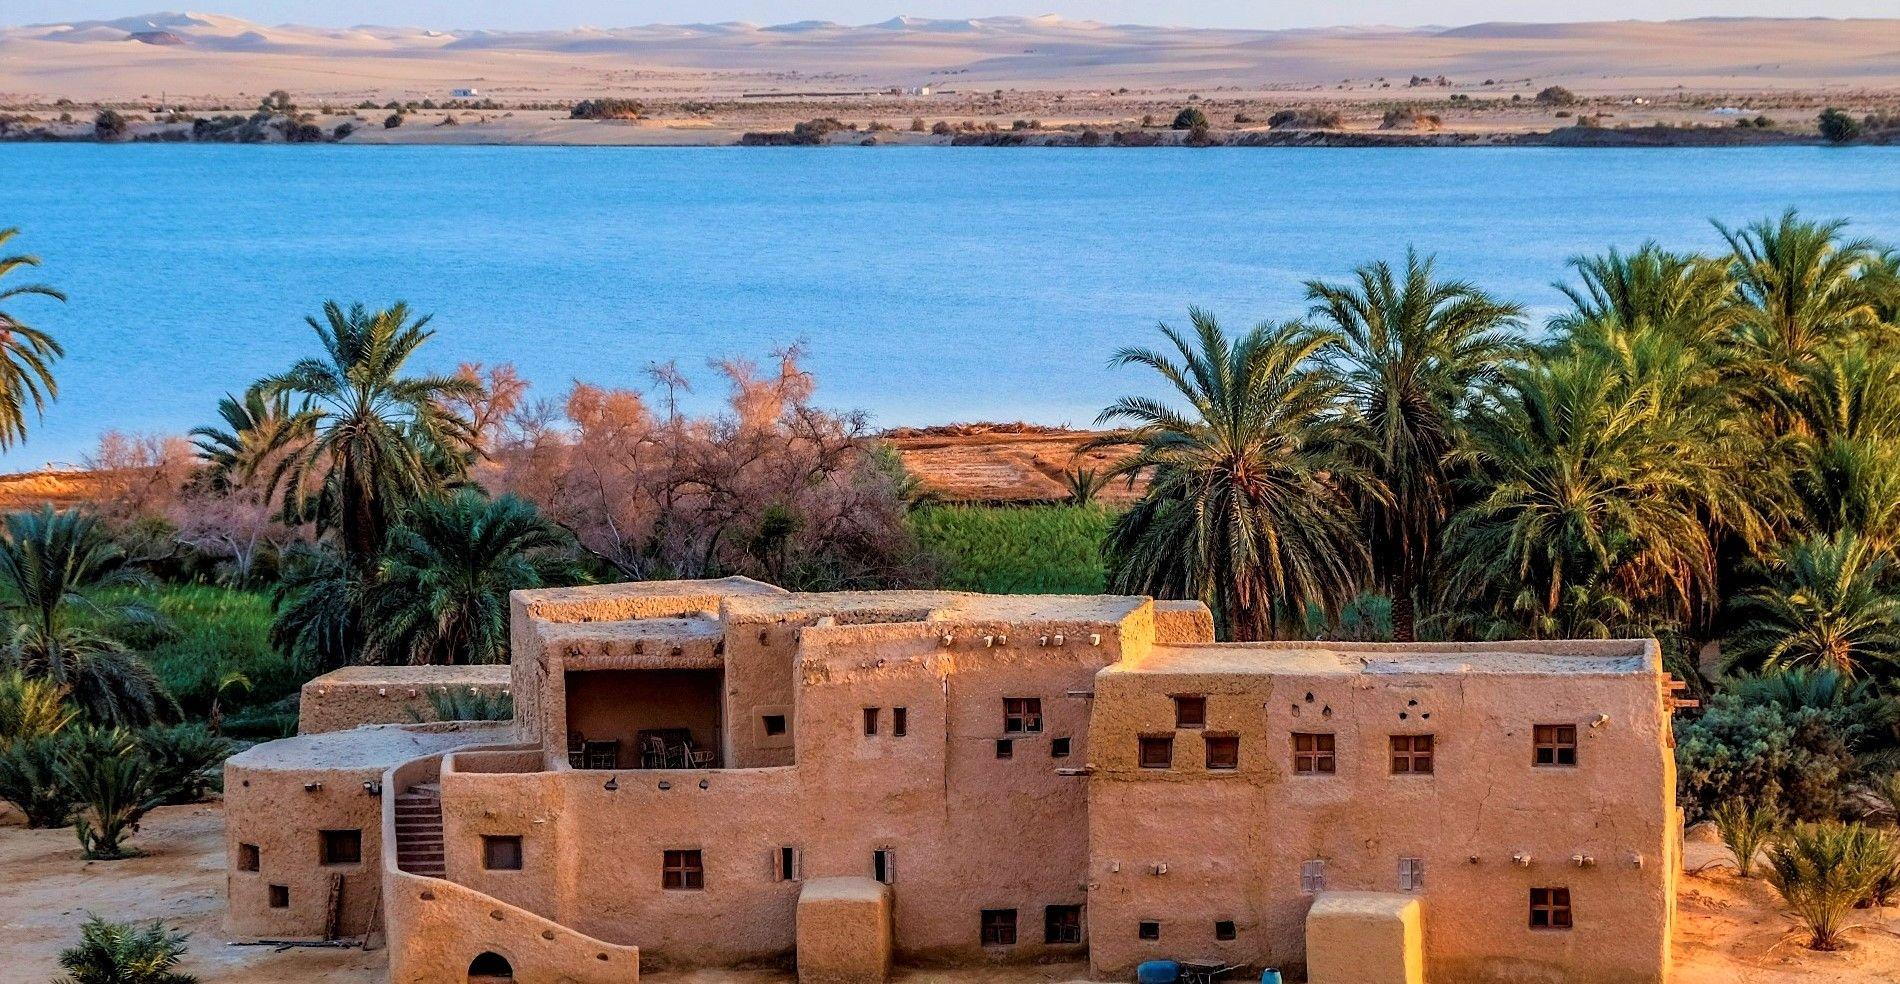 Pin By Terhalak ترحالك On Medical Tourism Egypt Tours Siwa Oasis Egypt Travel